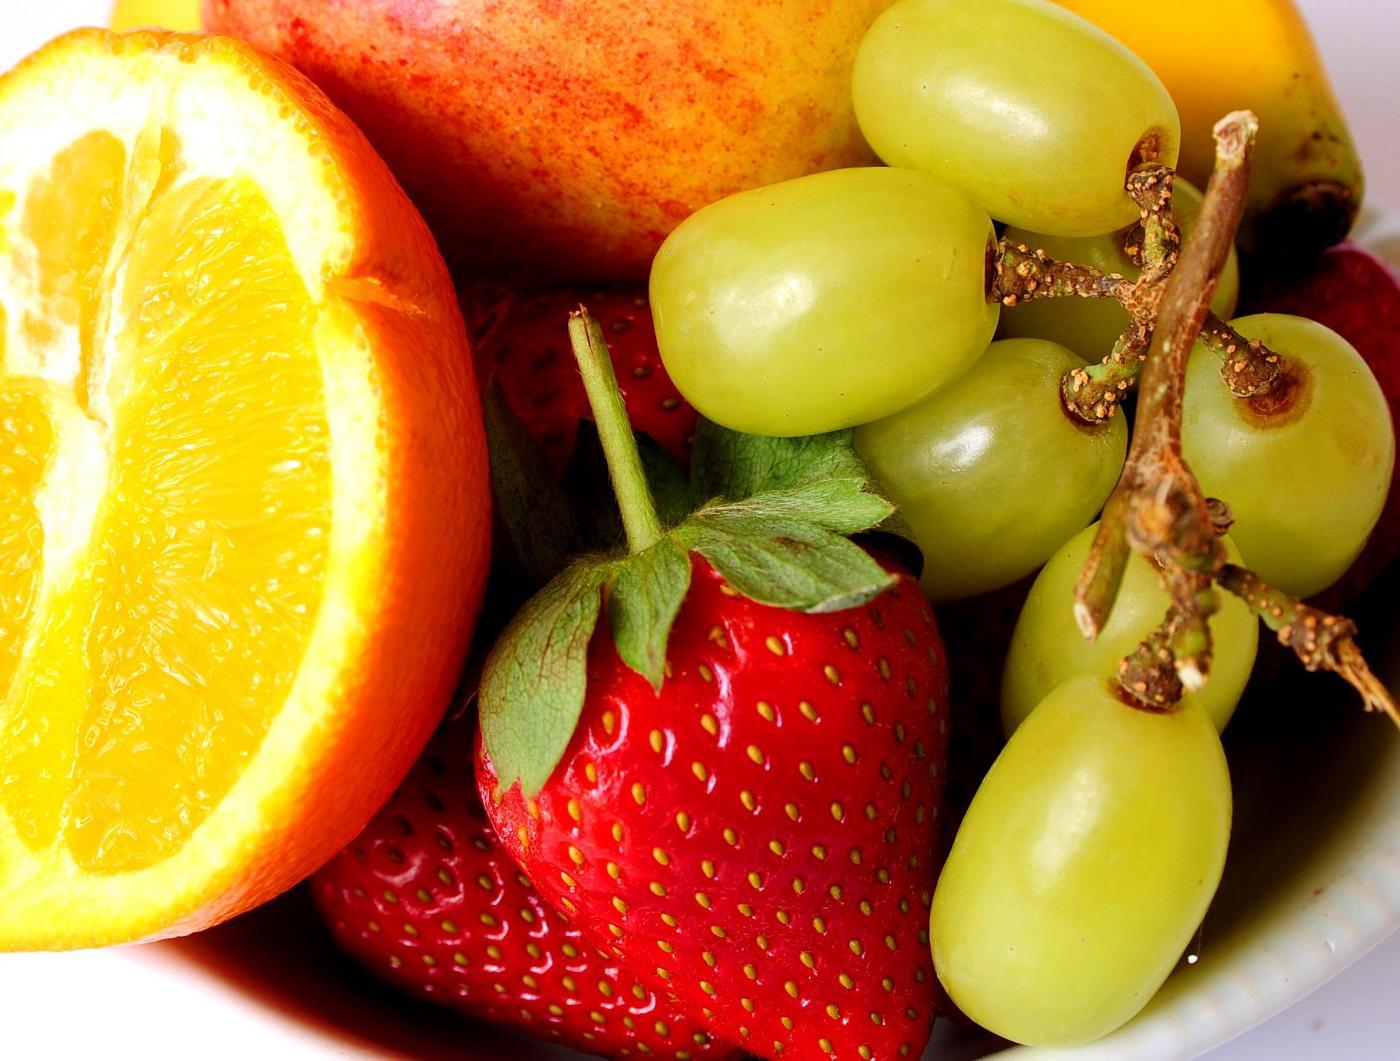 Frutta verdura spezie pesci contaminati